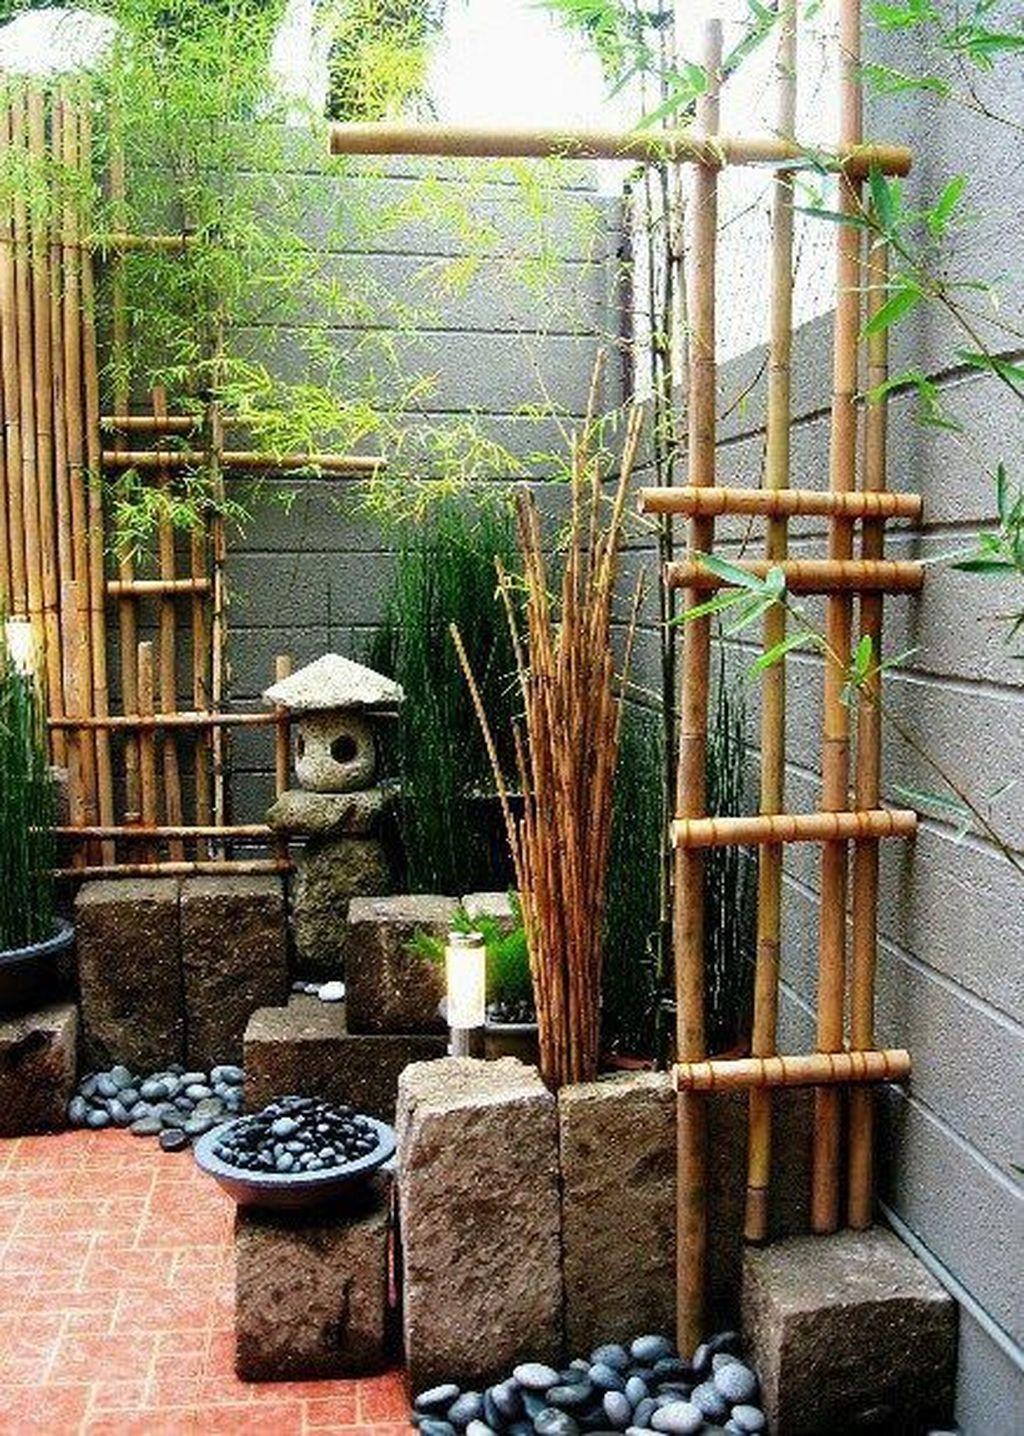 Beautiful Modern Rock Garden Ideas For Backyard Landscaping 06 Hmdcrtn,Magazine Customer Service